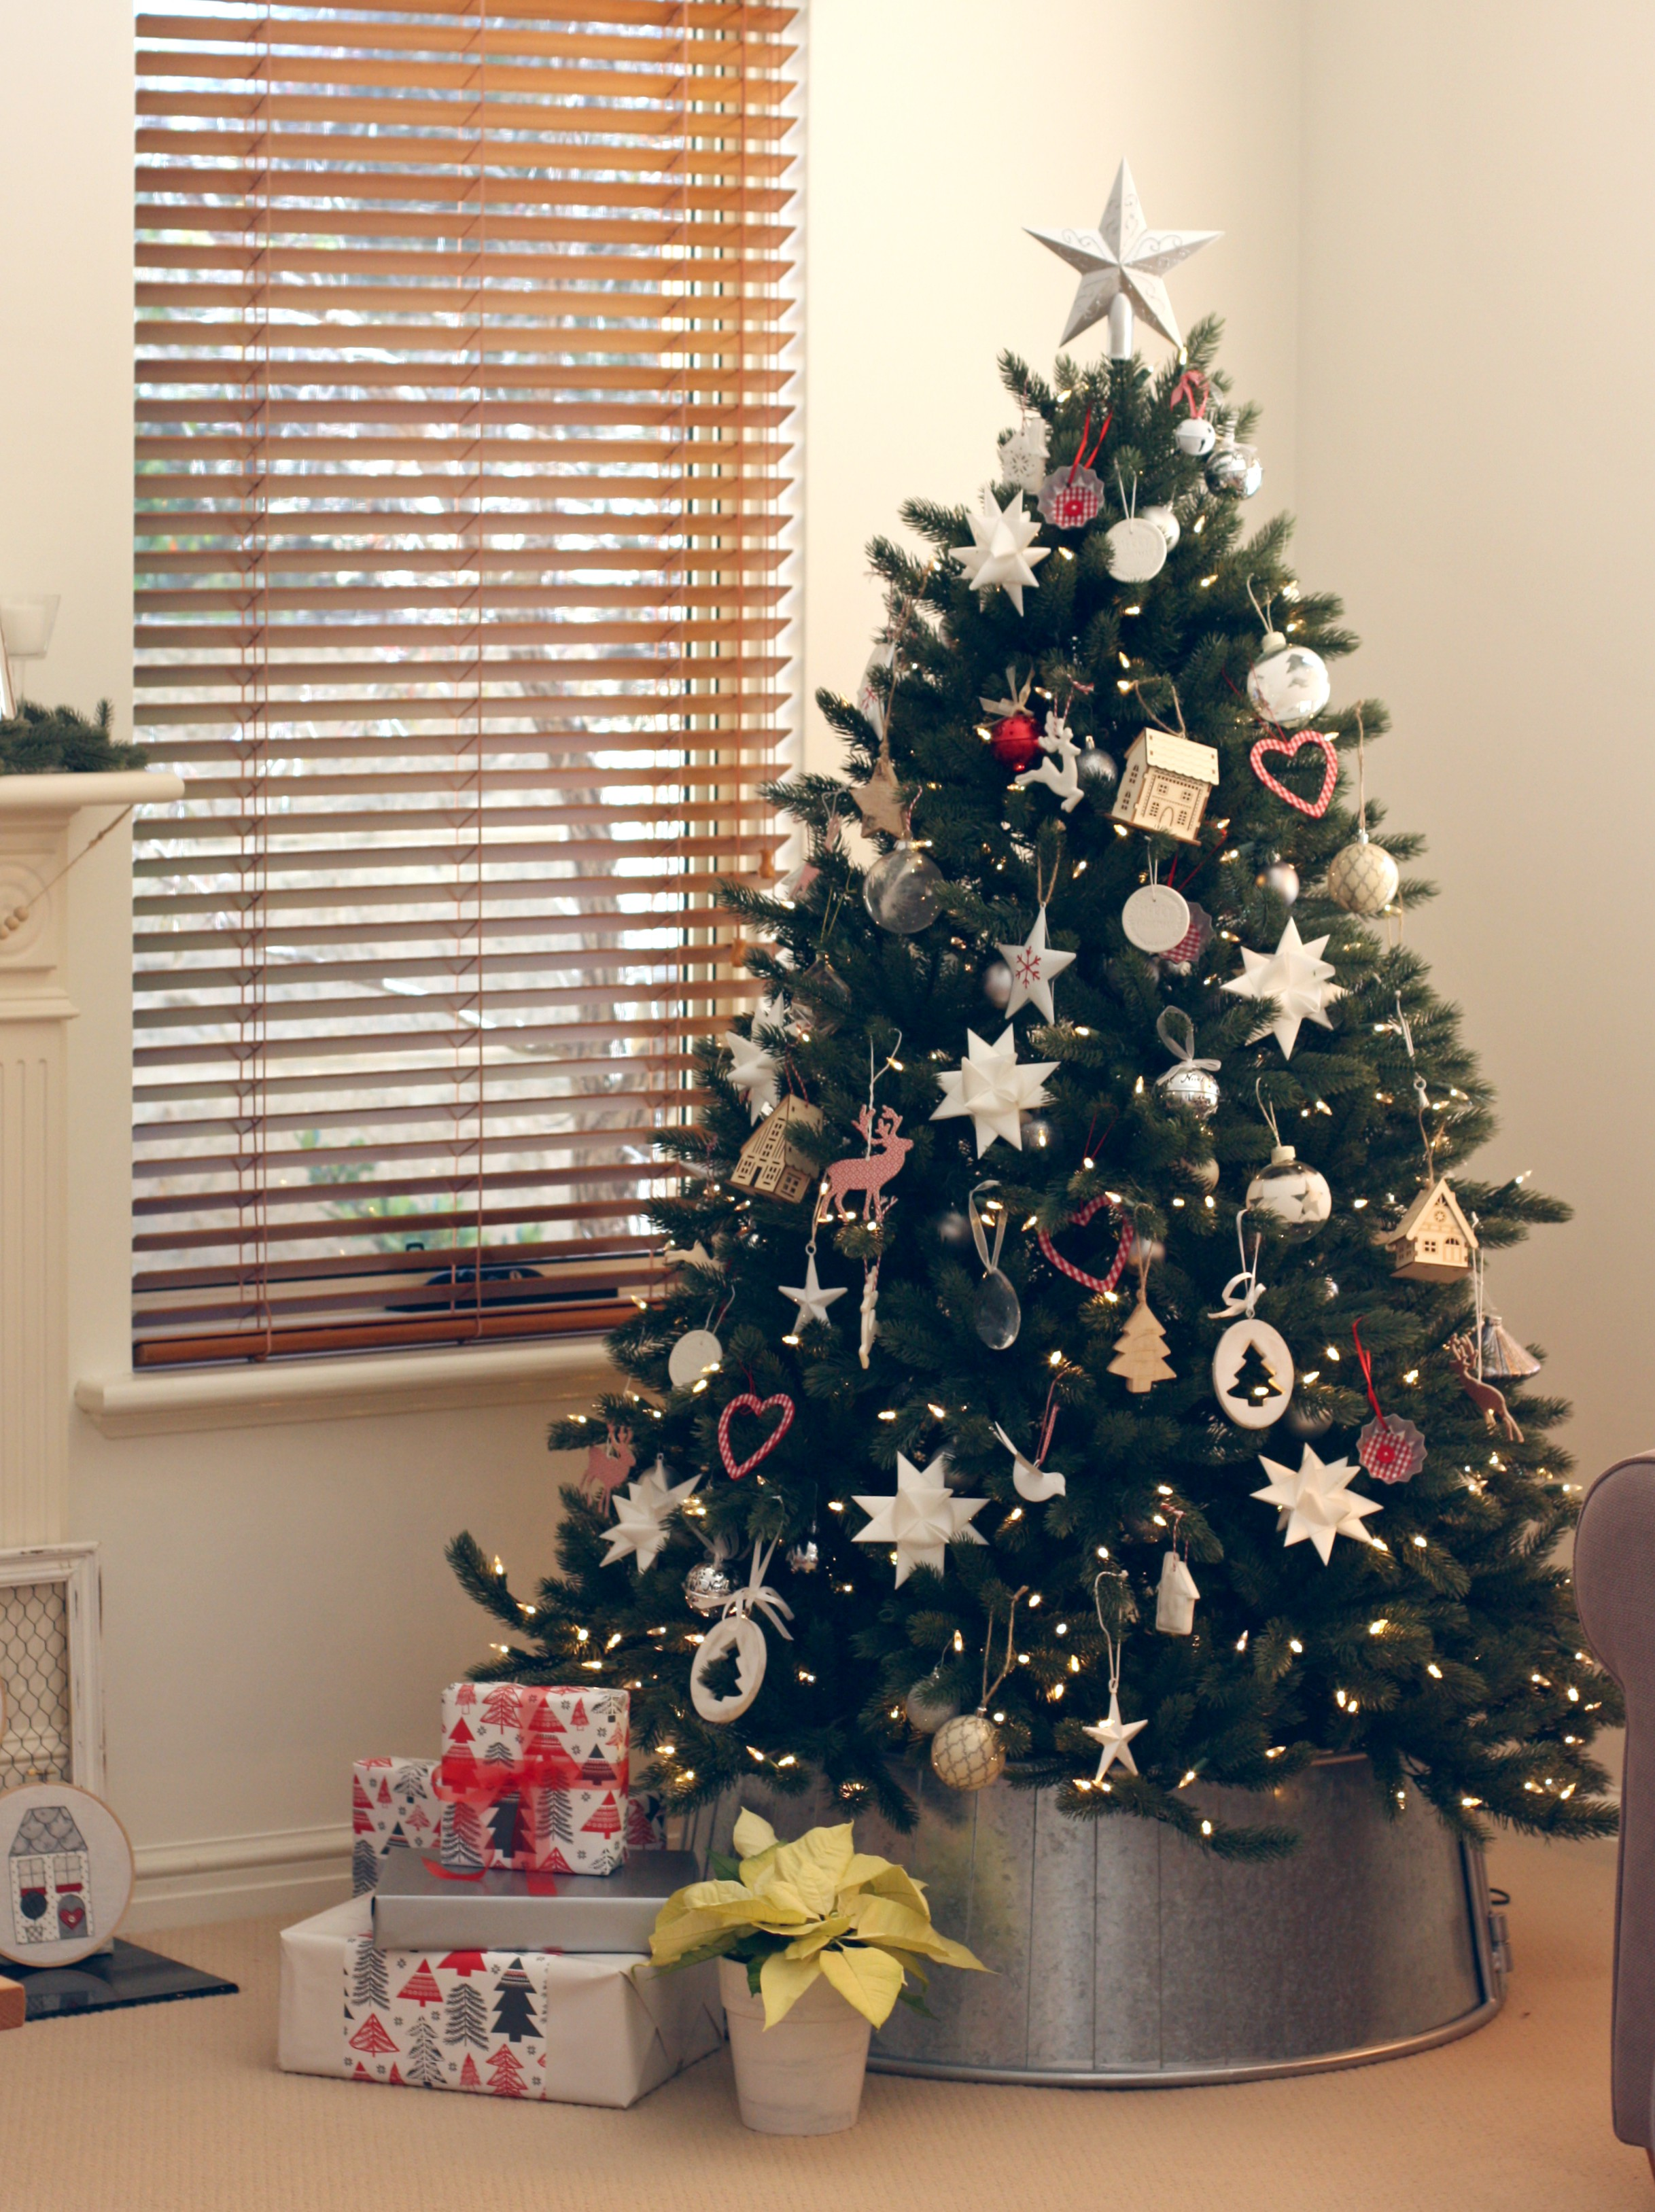 Scandinavian Christmas Decorating - A Spoonful of Sugar